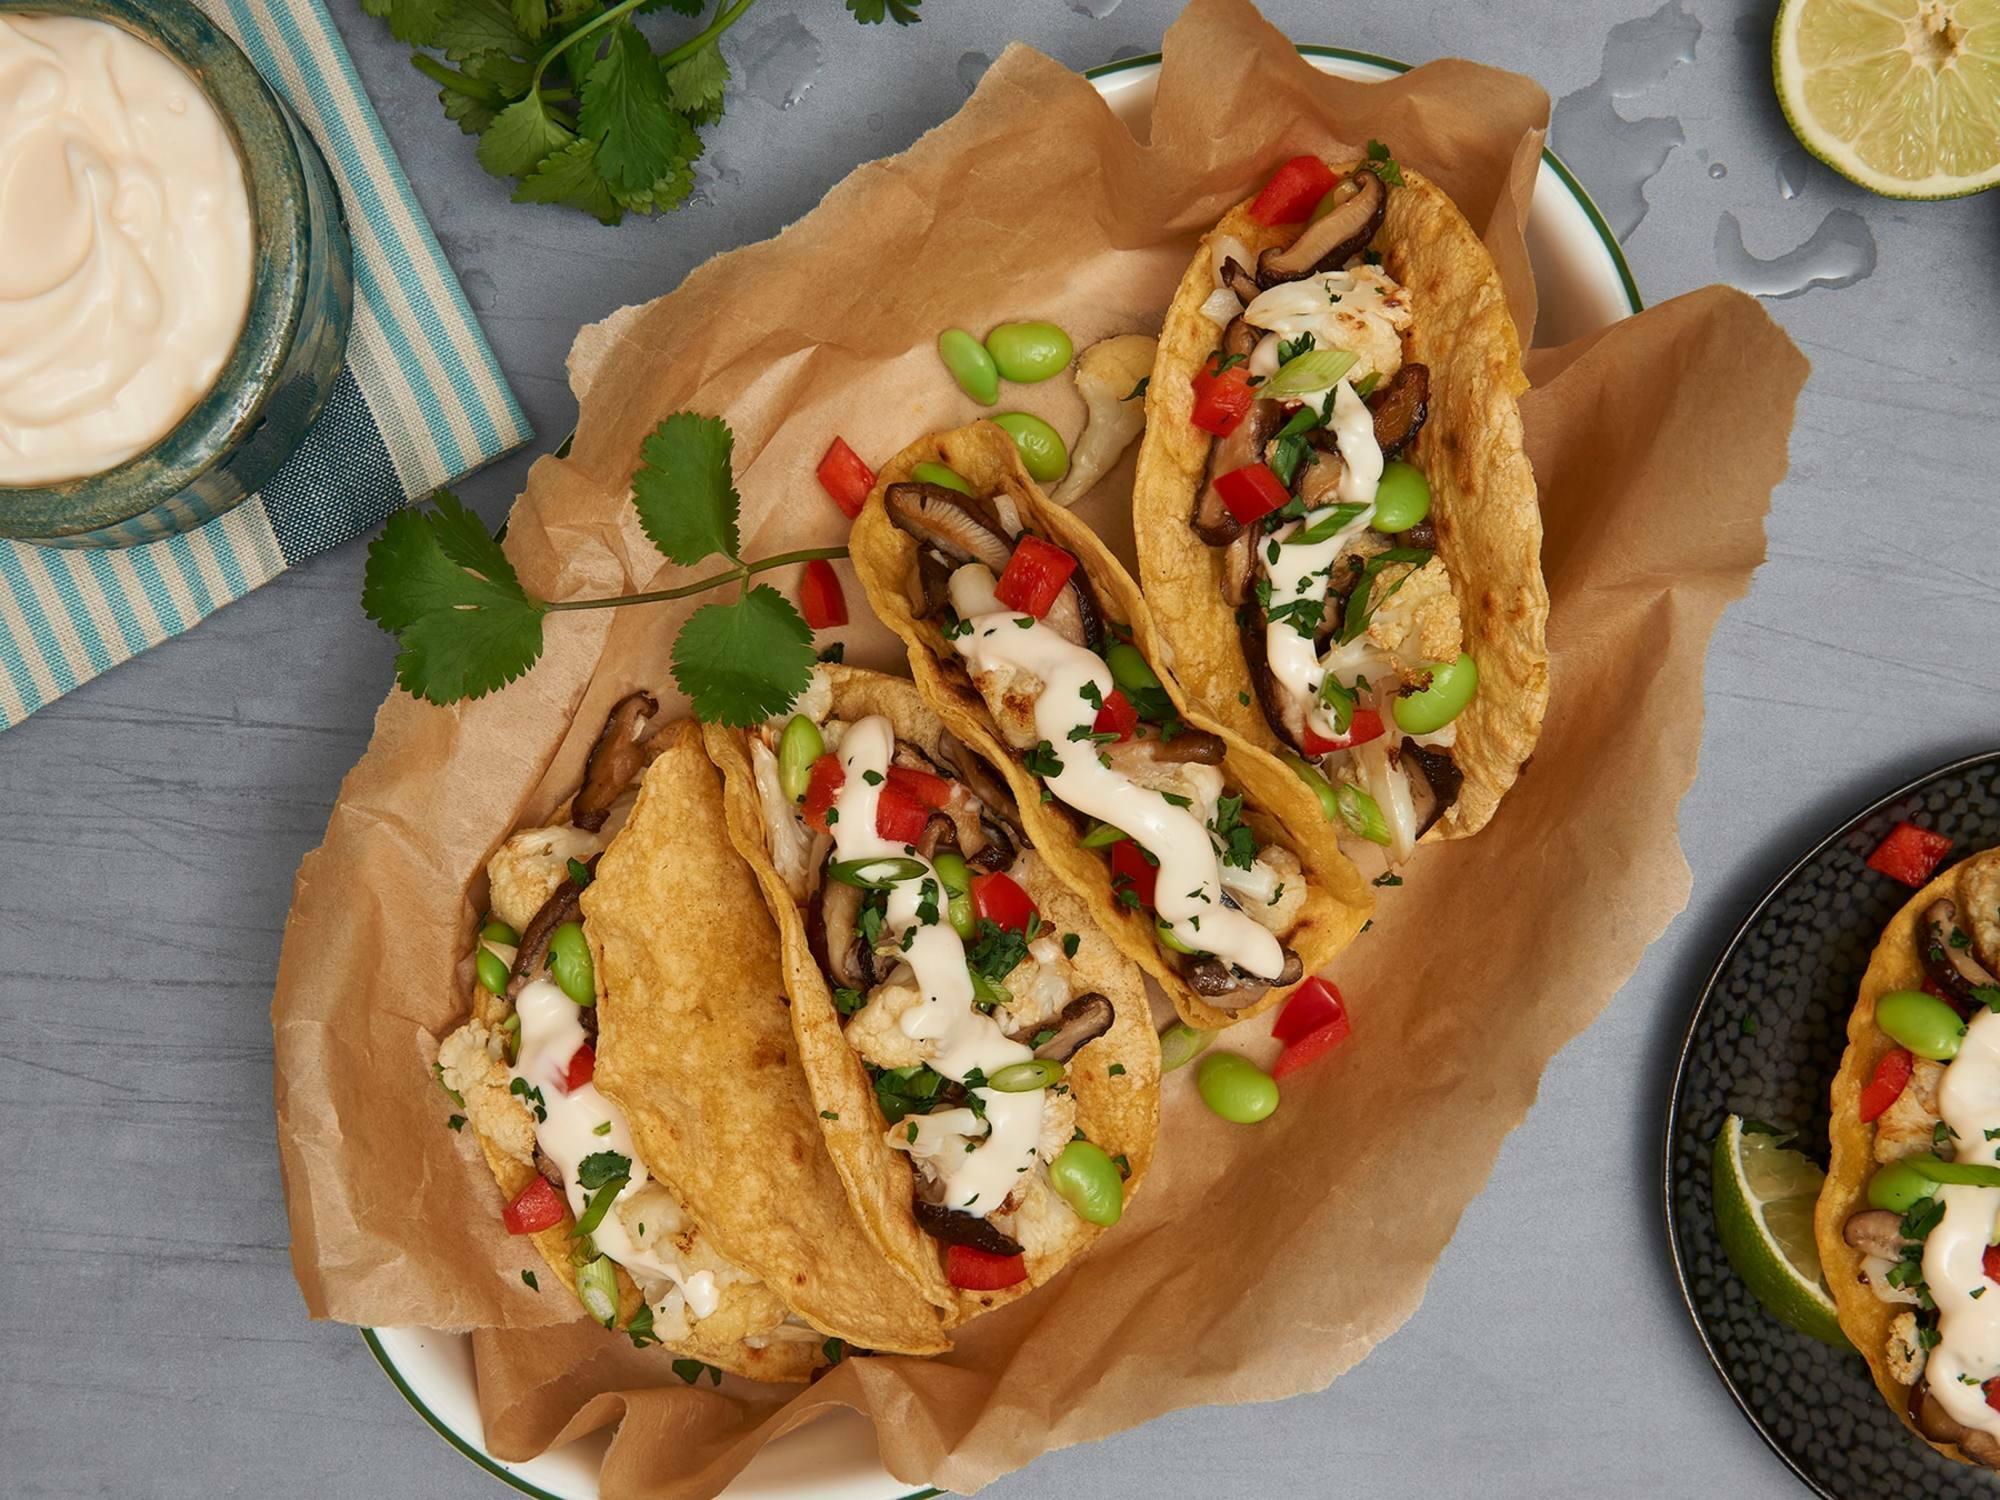 Asian Fusion Tacos